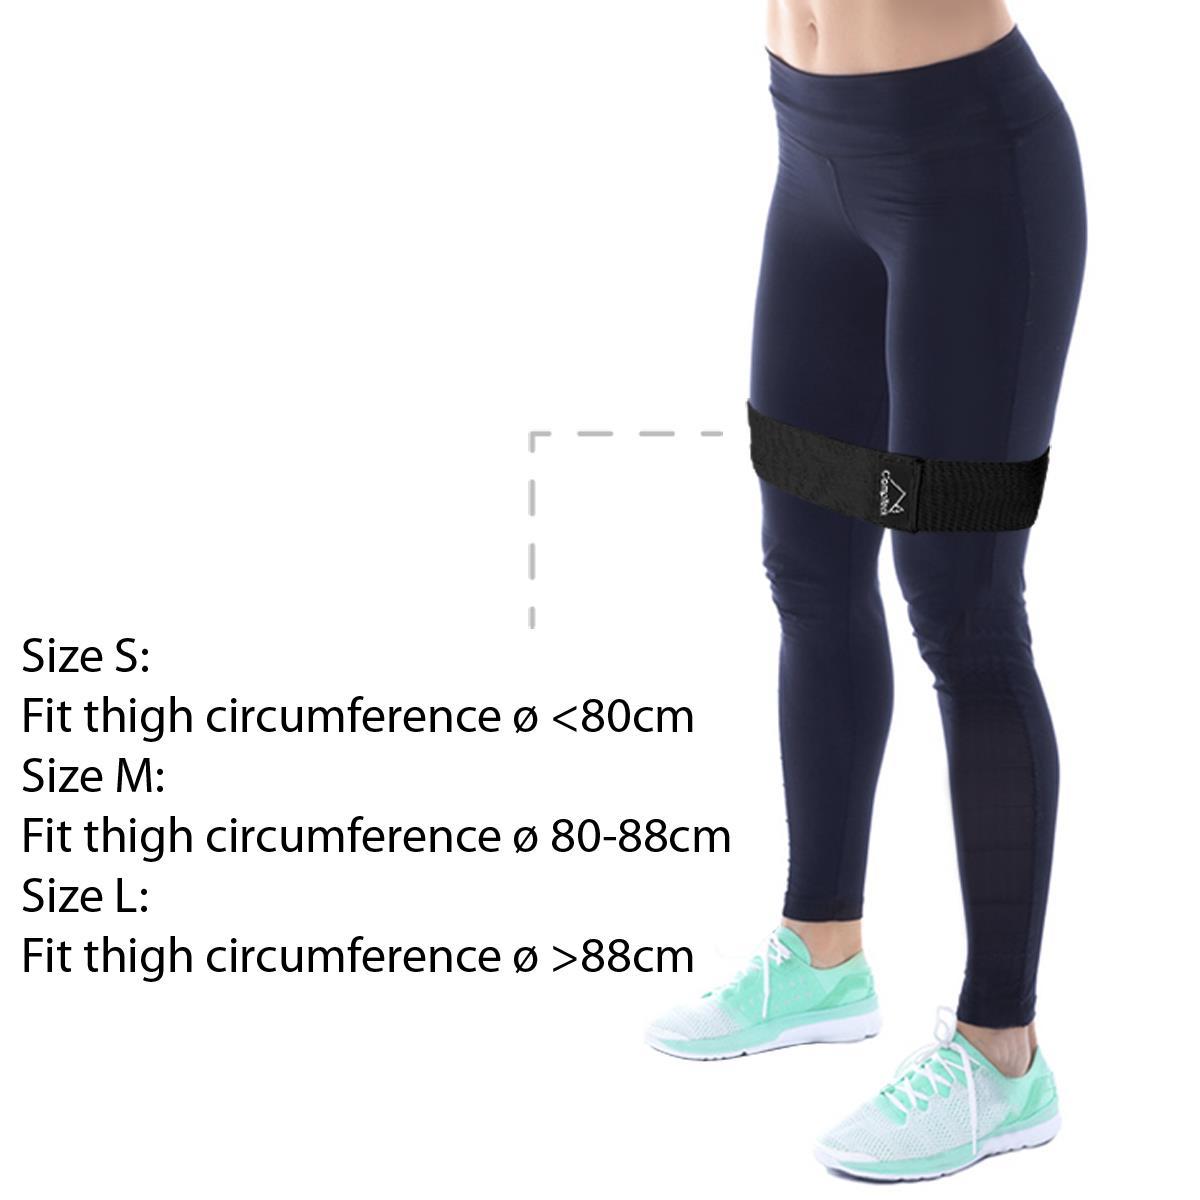 Hip-Band-Circle-Loop-Rotation-Glute-Resistance-Thrust-Leg-Squat-Gym-Exercise miniatuur 12